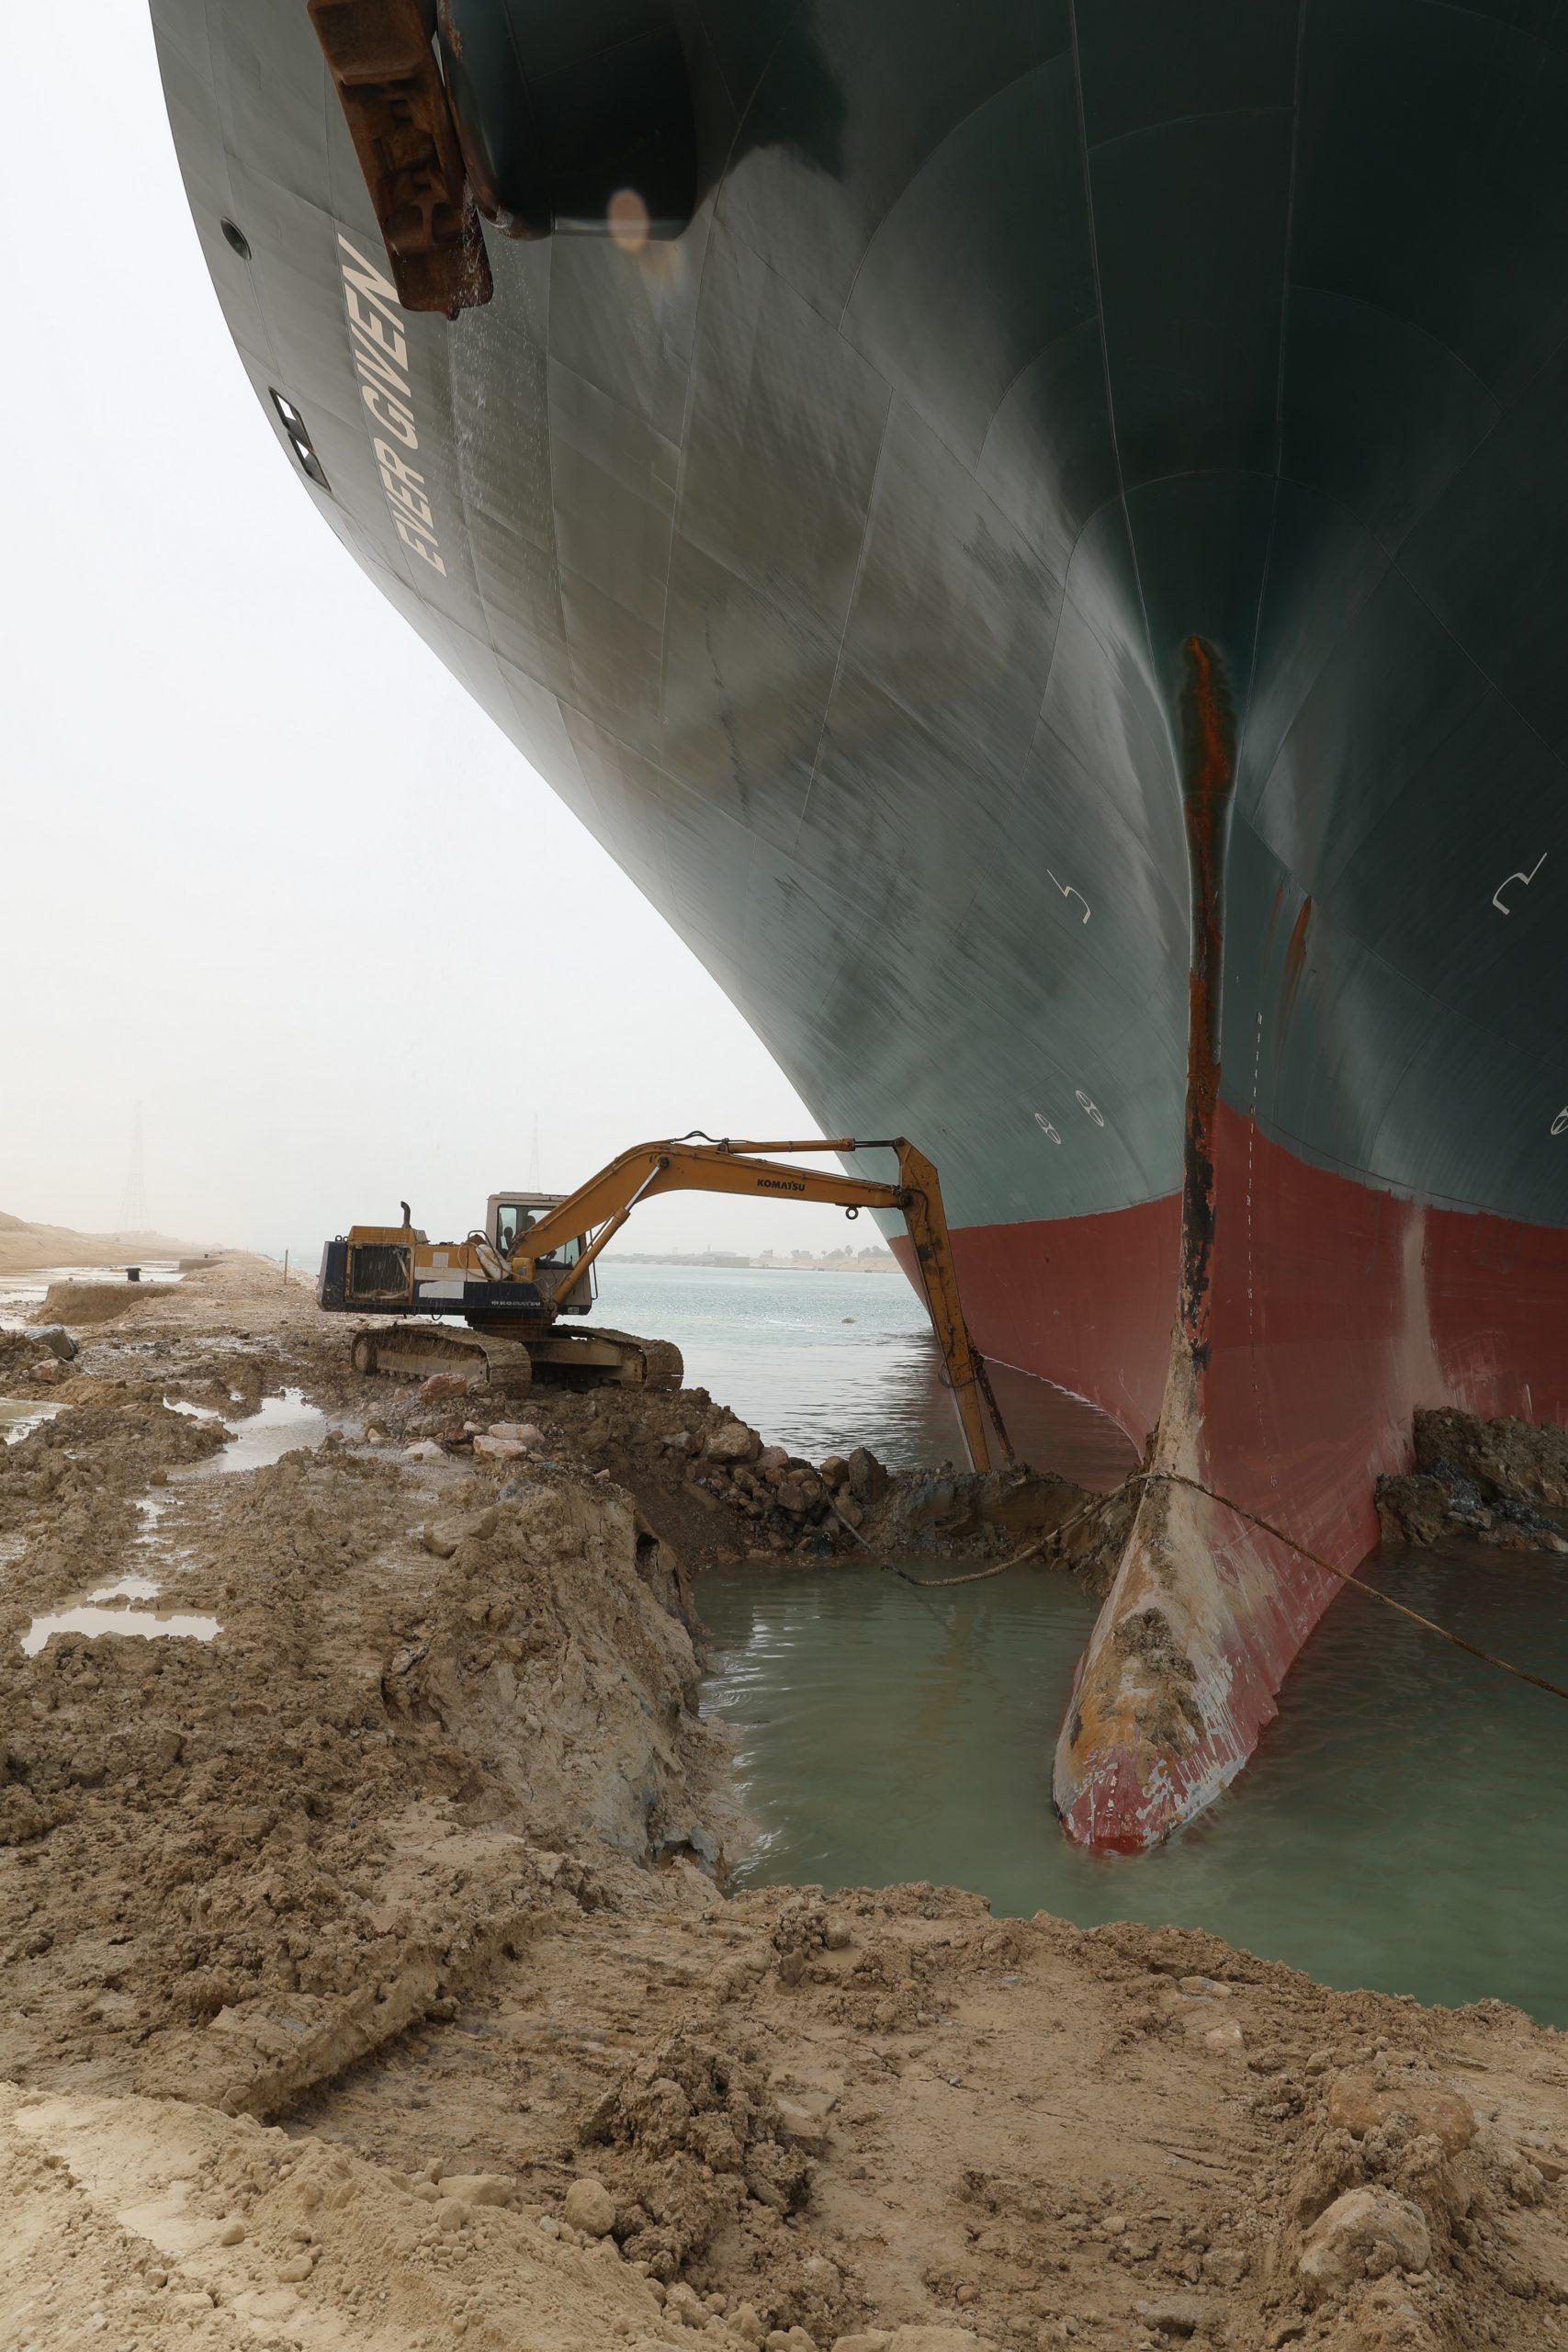 Escavadora a retirar areia para desancalhar Ever Given